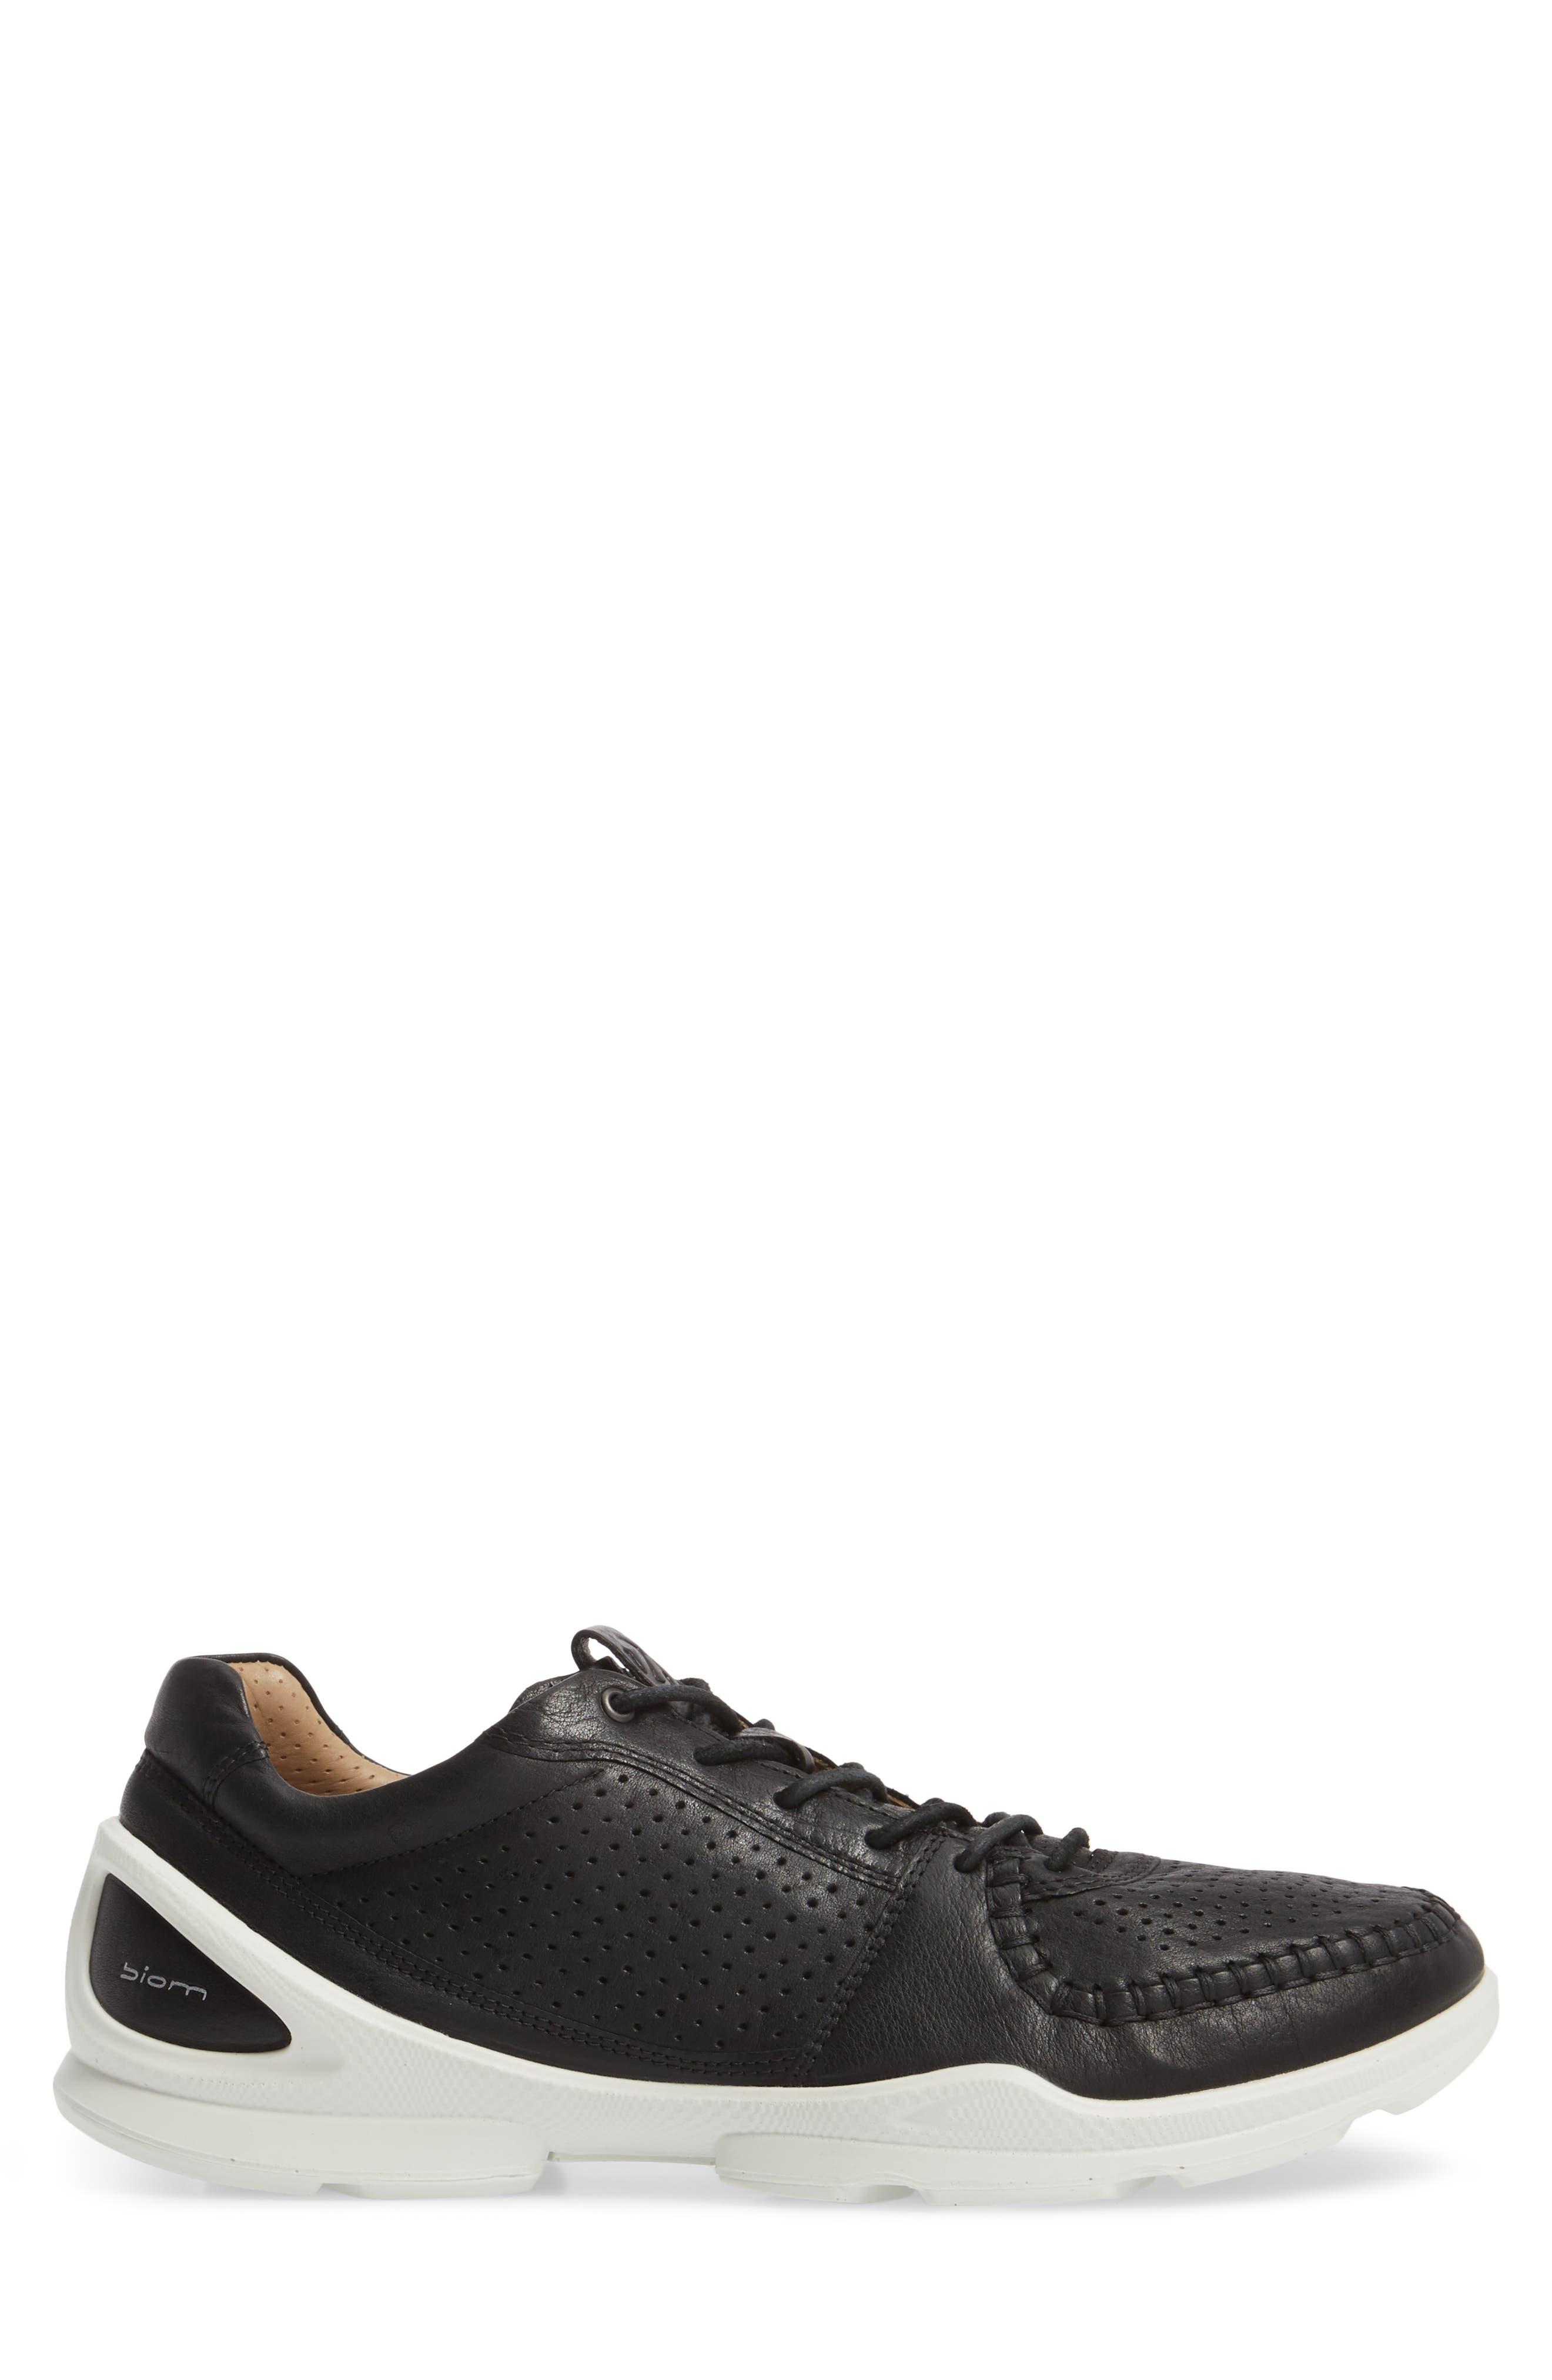 BIOM Street Moc Toe Sneaker,                             Alternate thumbnail 3, color,                             008